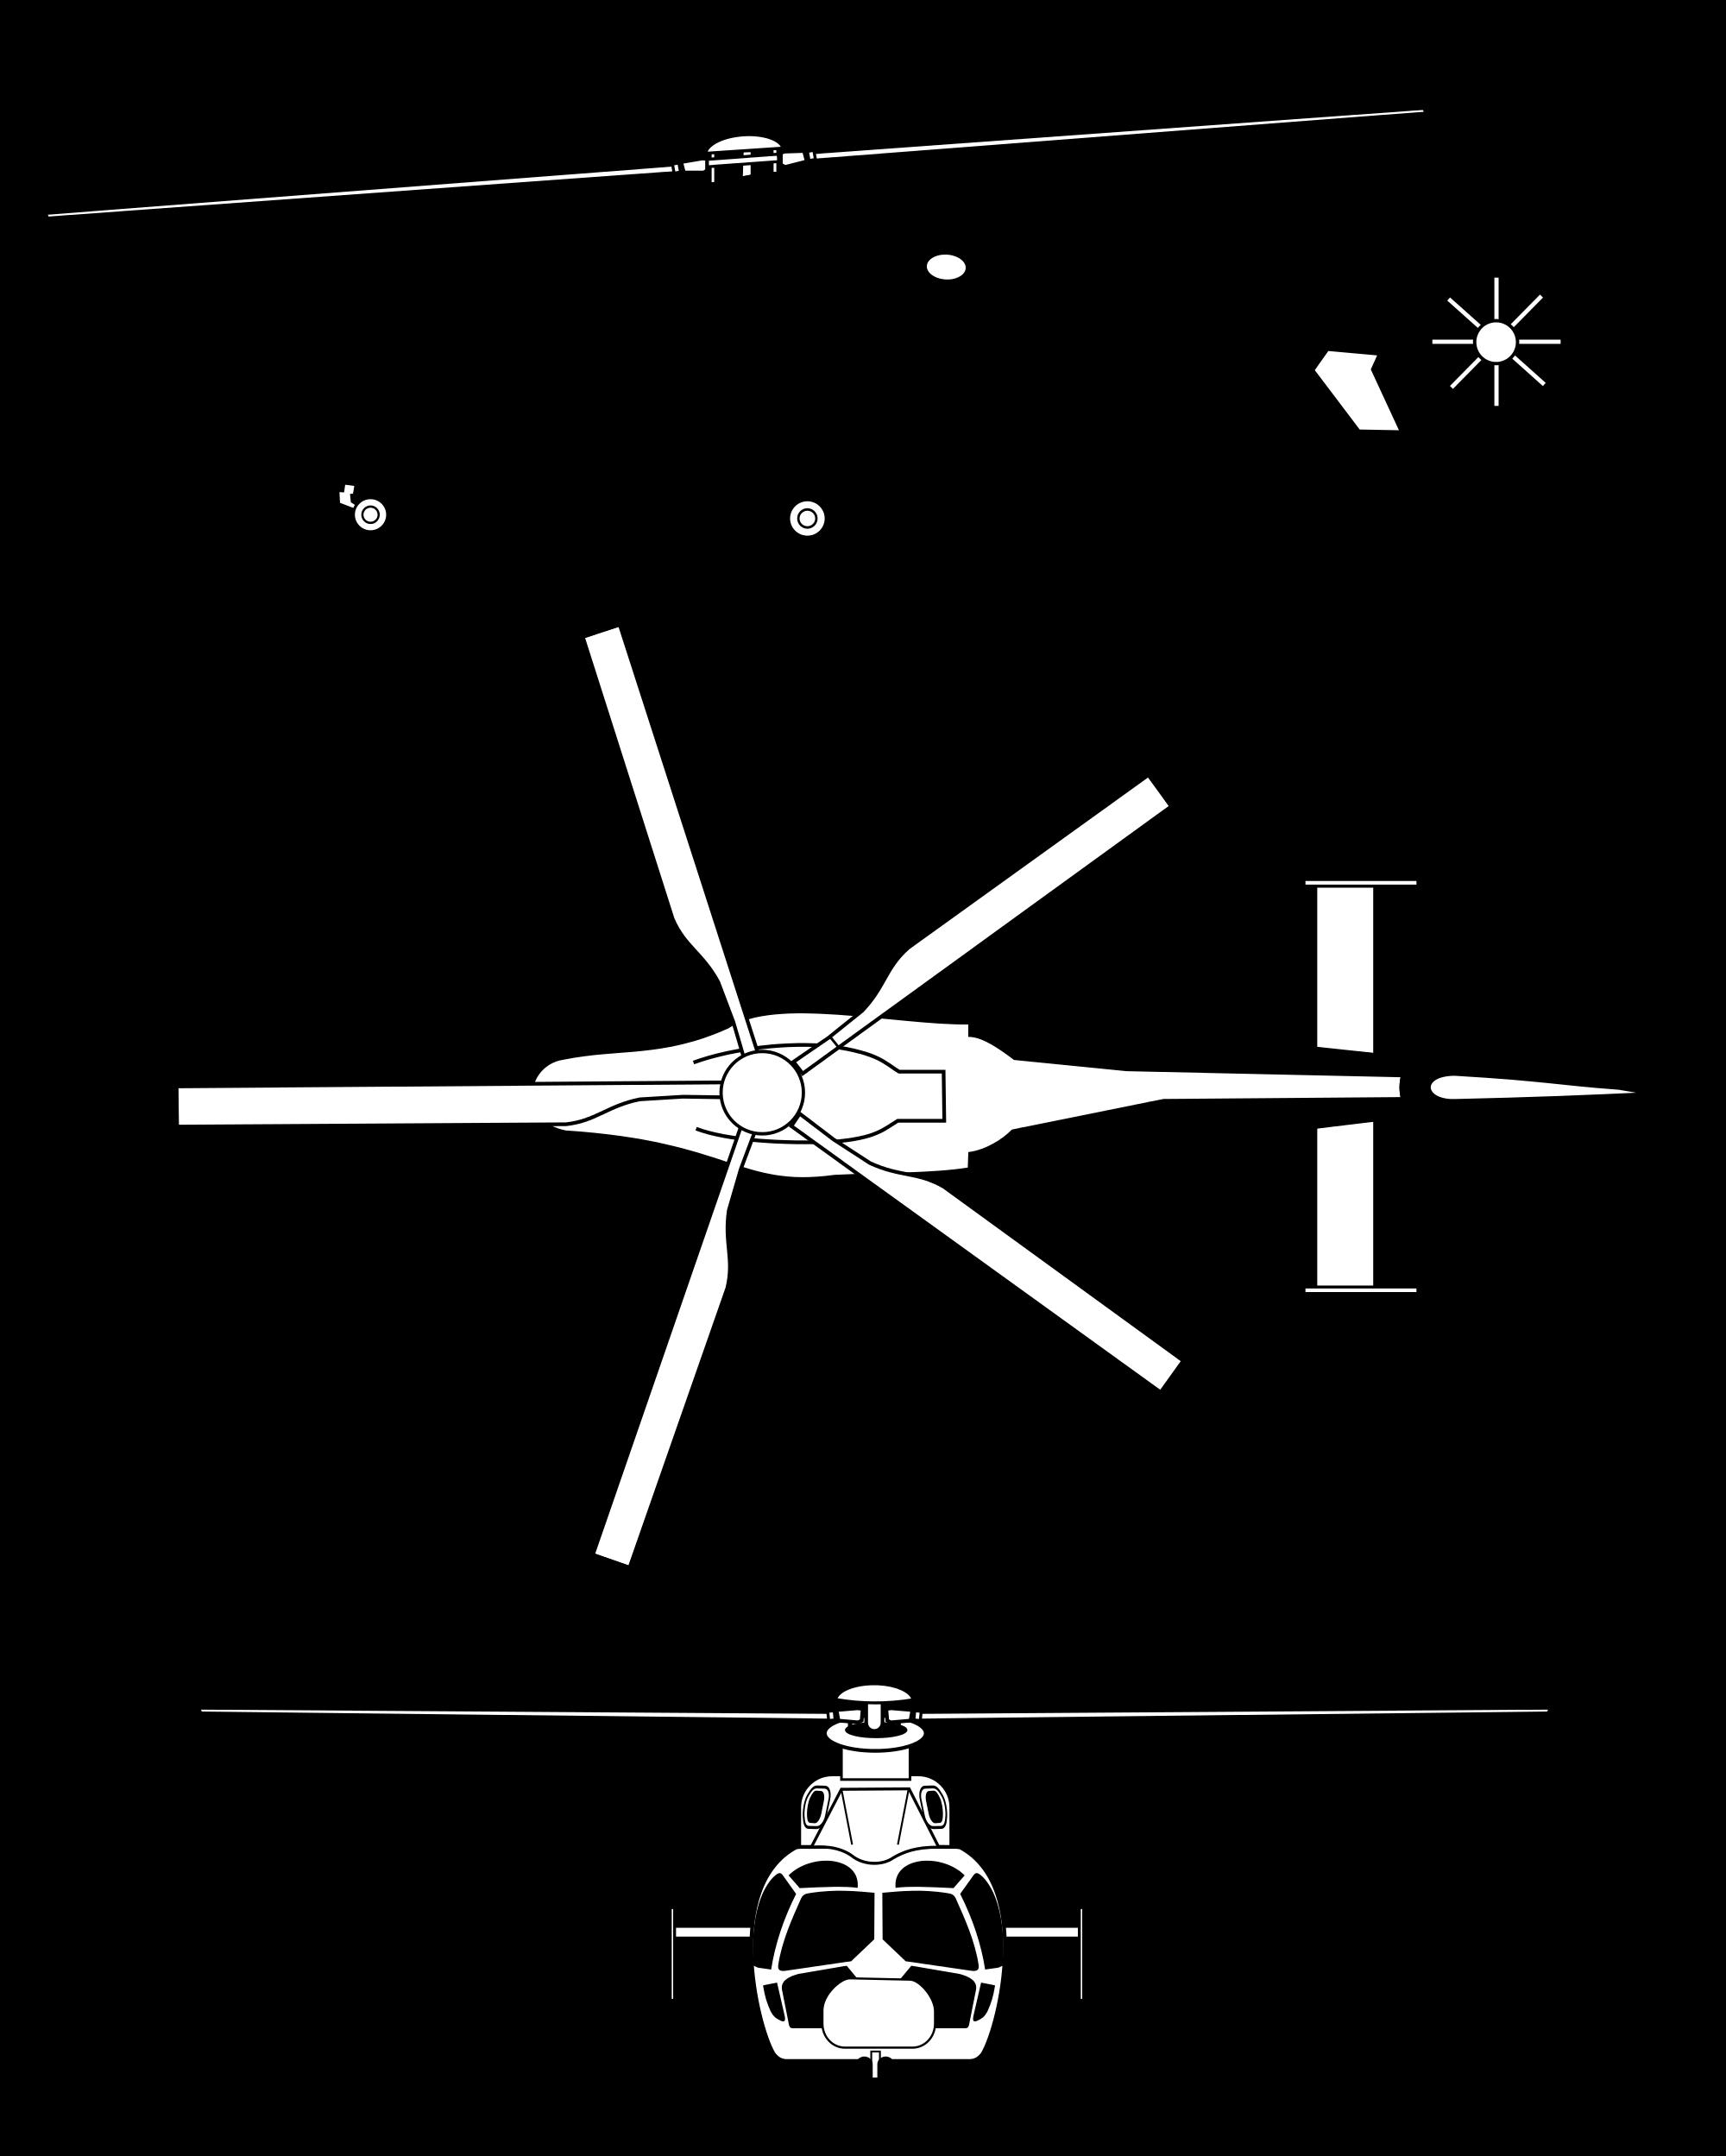 Eurocopter EC155 blueprint